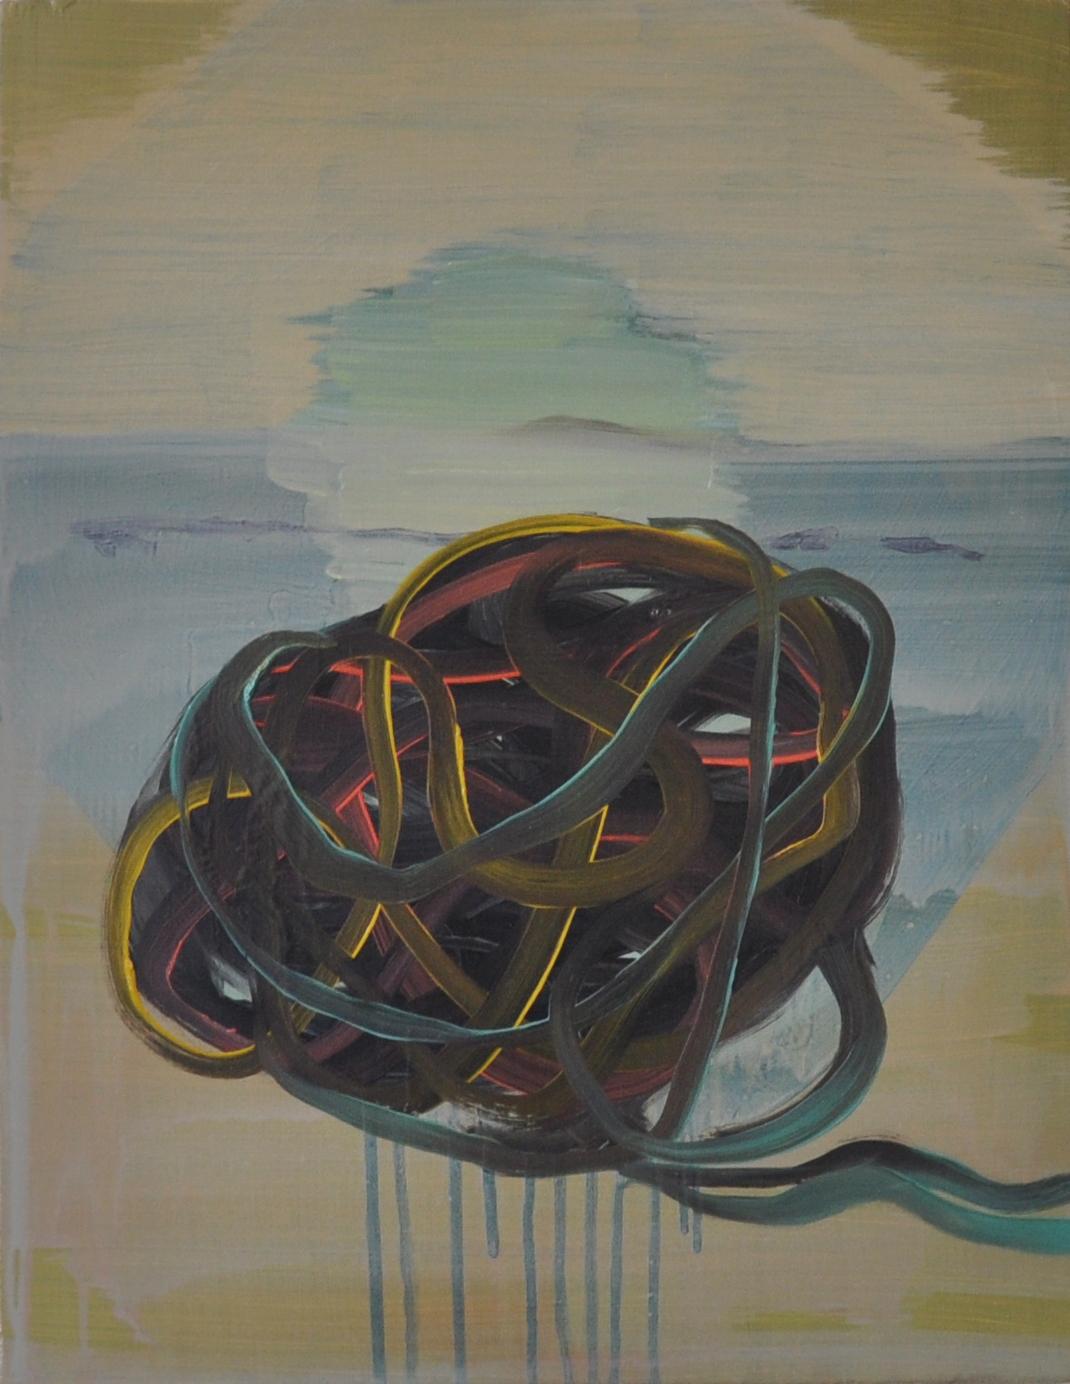 Knot, 2009, Oil on cotton, 46 x 36 cm